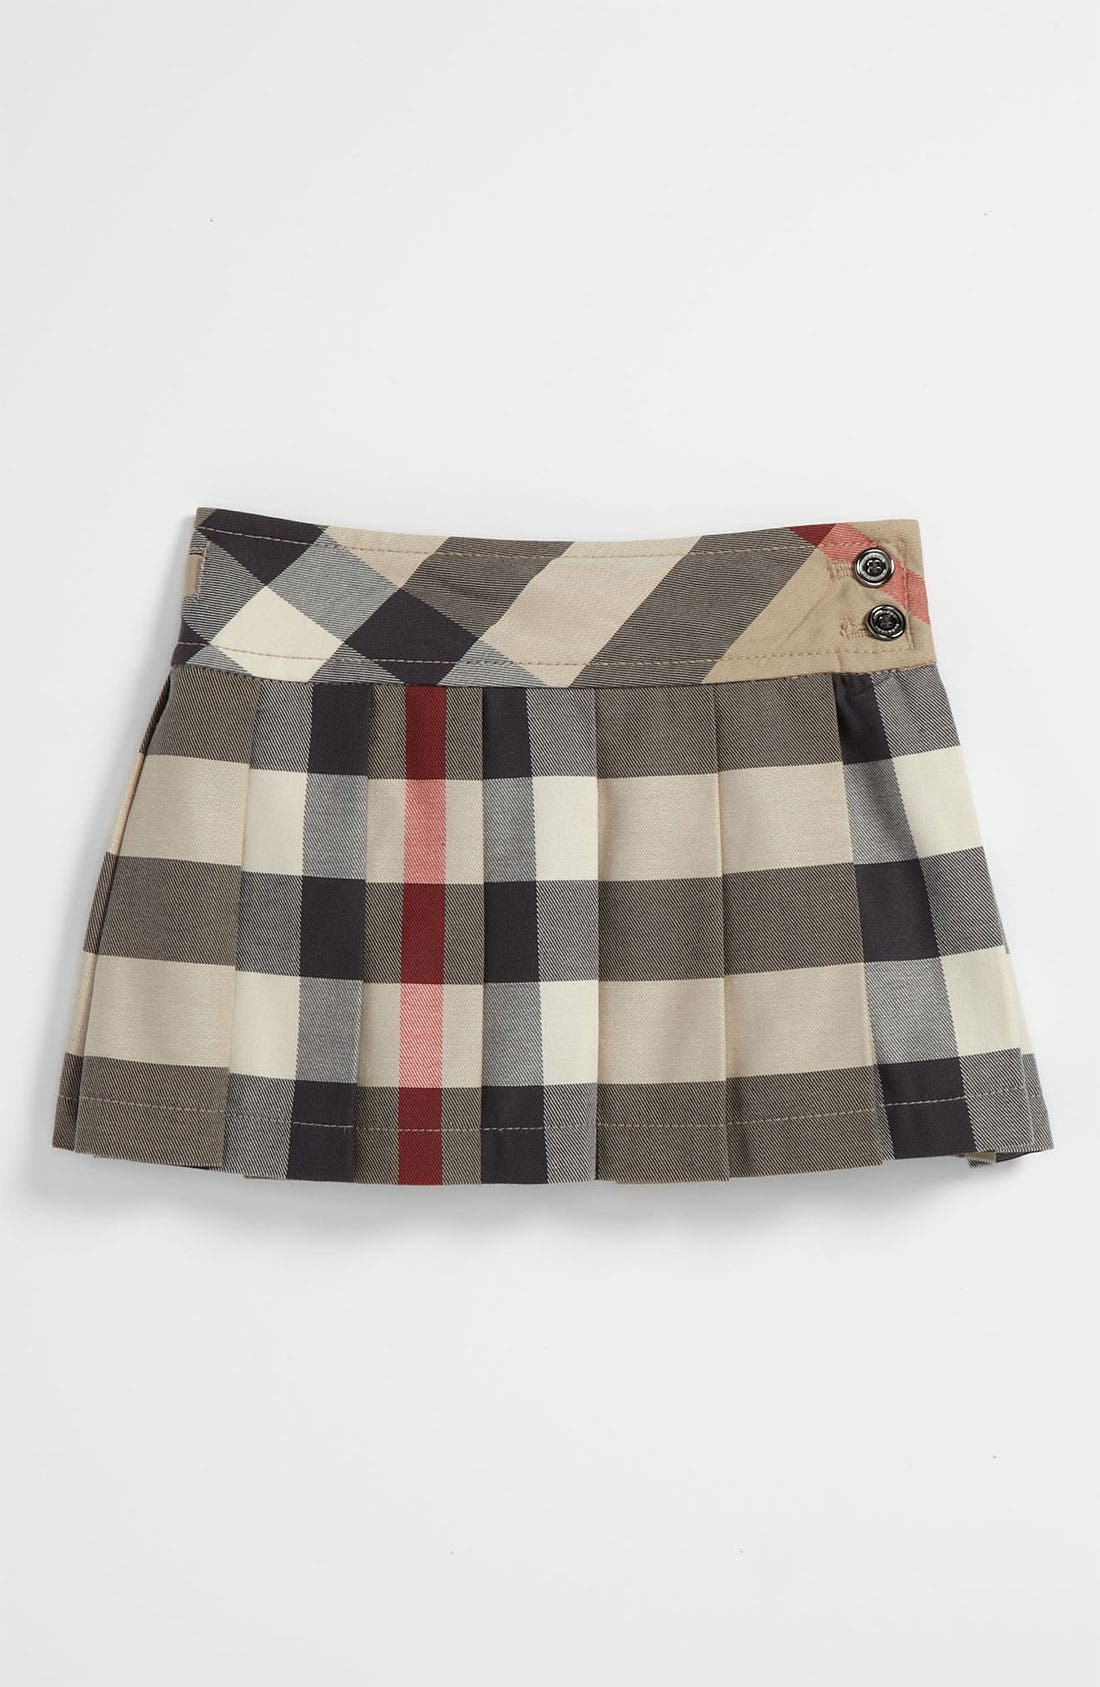 Alternate Image 1 Selected - Burberry Check Print Skirt (Toddler)